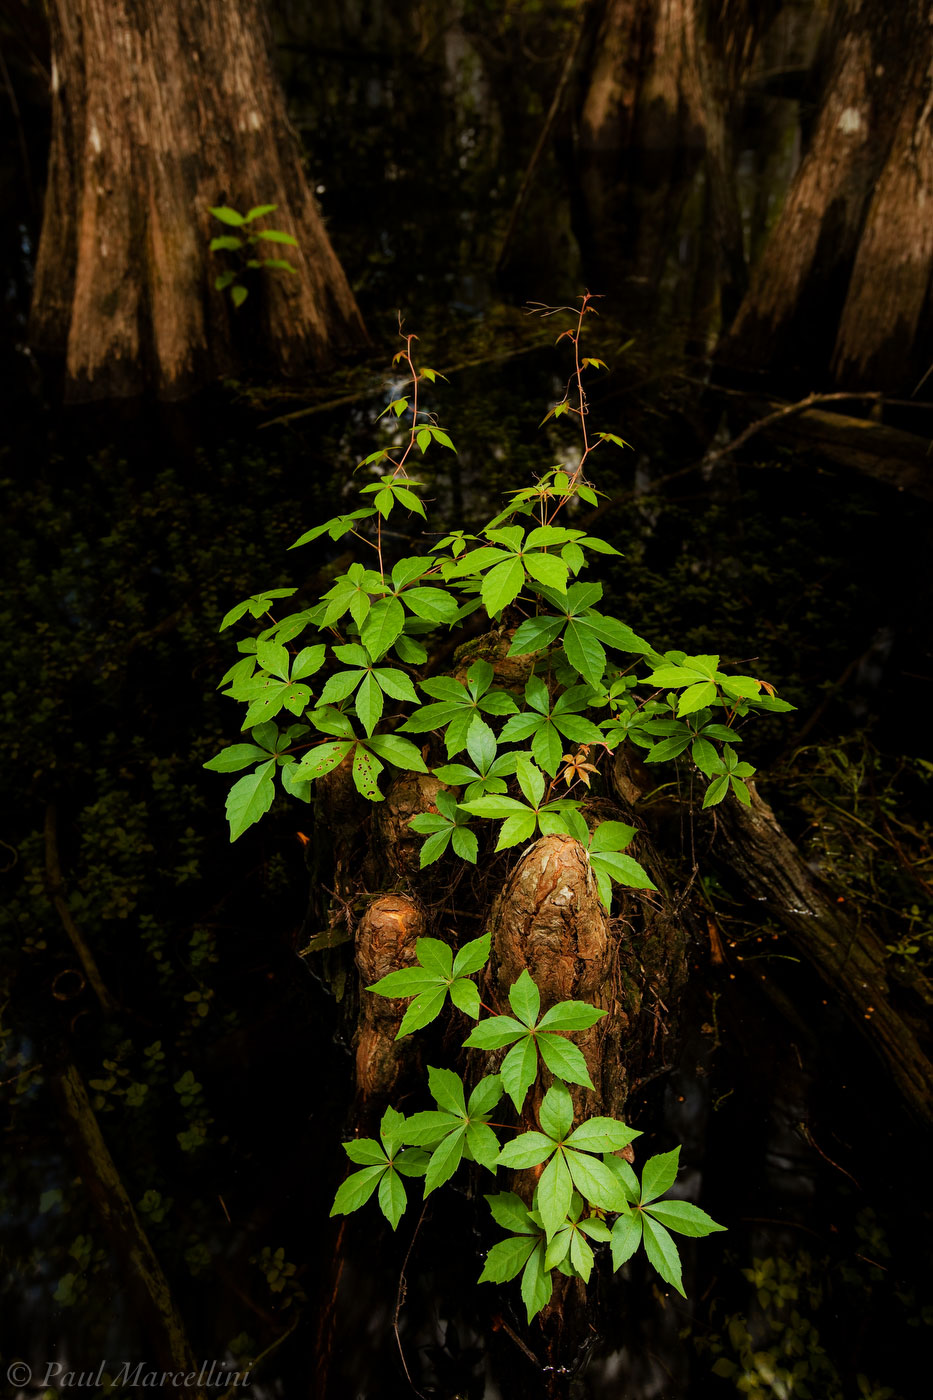 cypress, virginia creeper, Parthenocissus quinquefolia, swamp, big cypress, Florida, nature, photography, photo